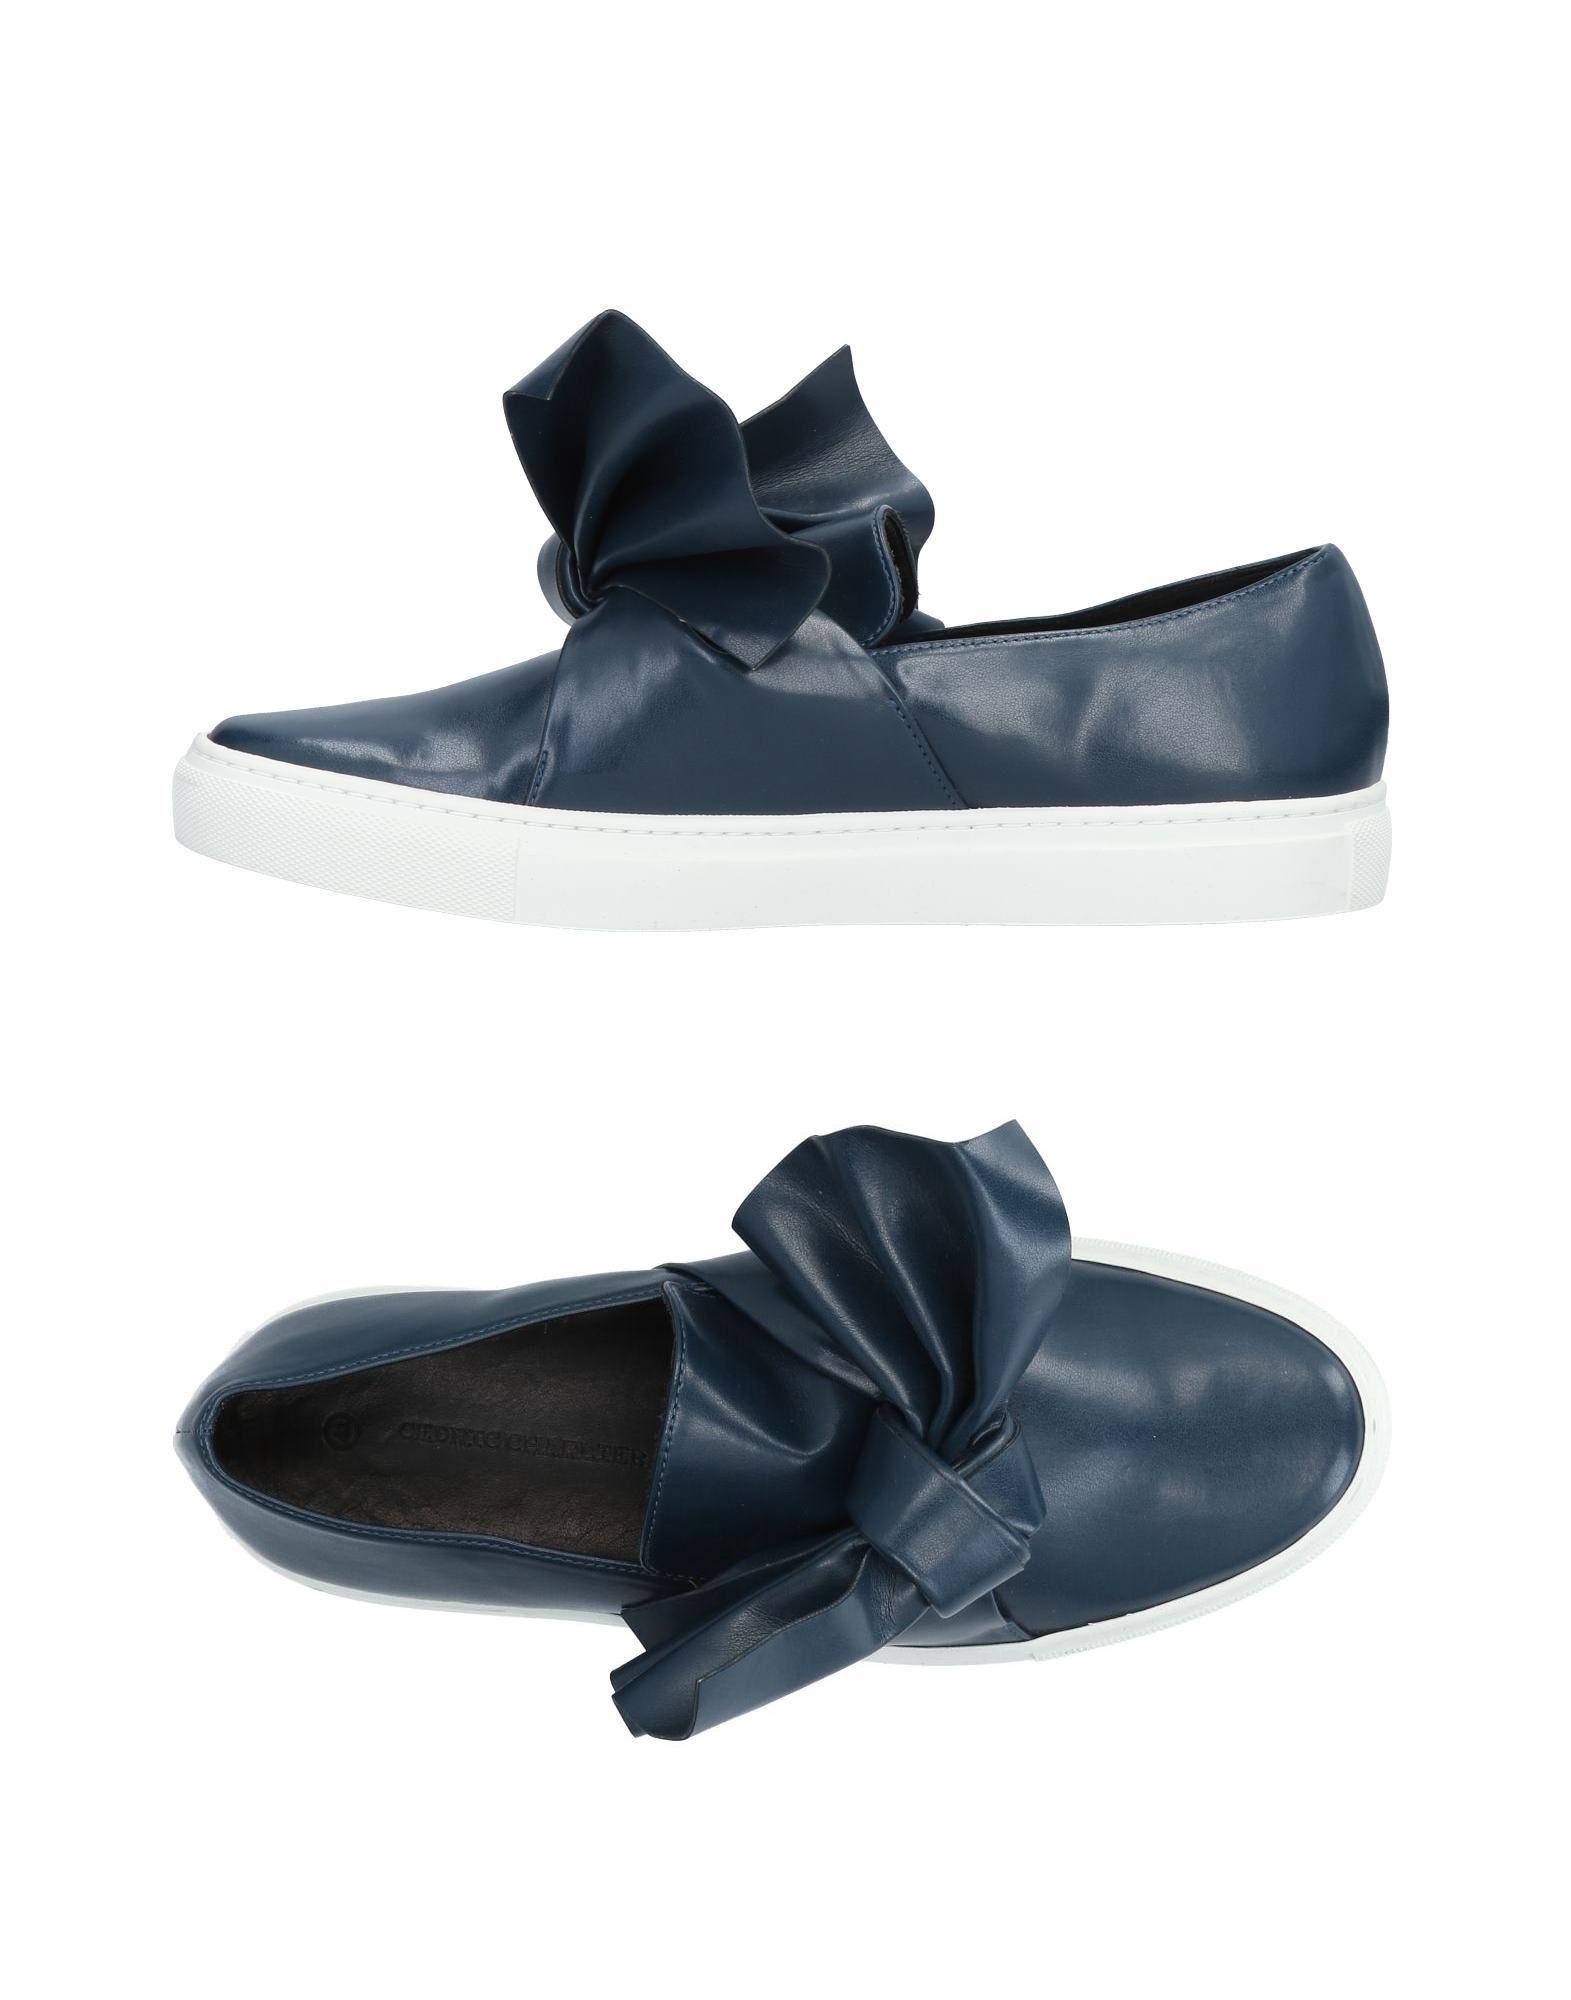 Stilvolle Stilvolle Stilvolle billige Schuhe Cedric Charlier Mokassins Damen  11476484EF 04a56a